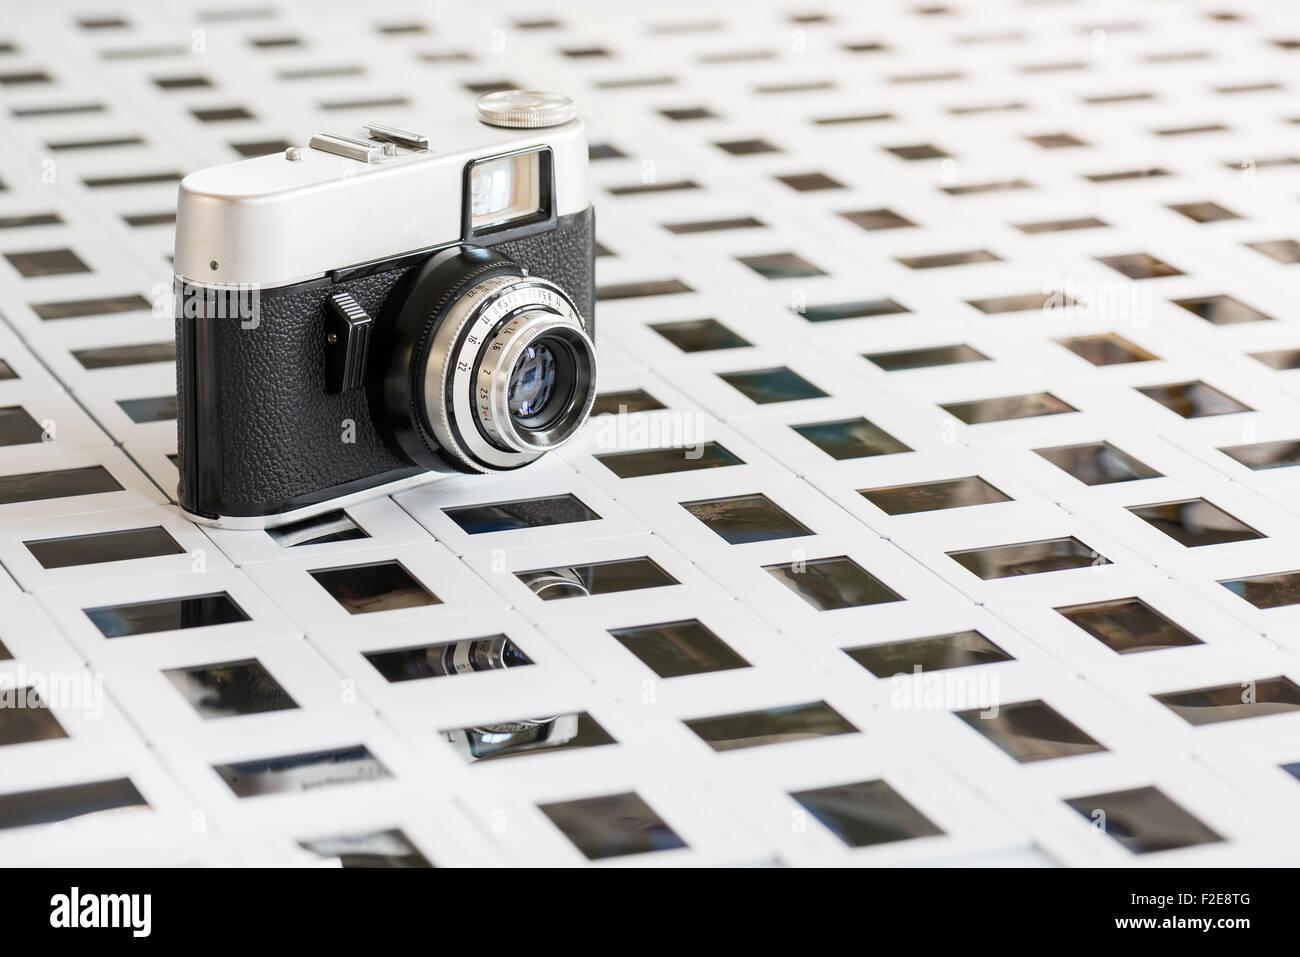 old camera resting on floor of slide - Stock Image